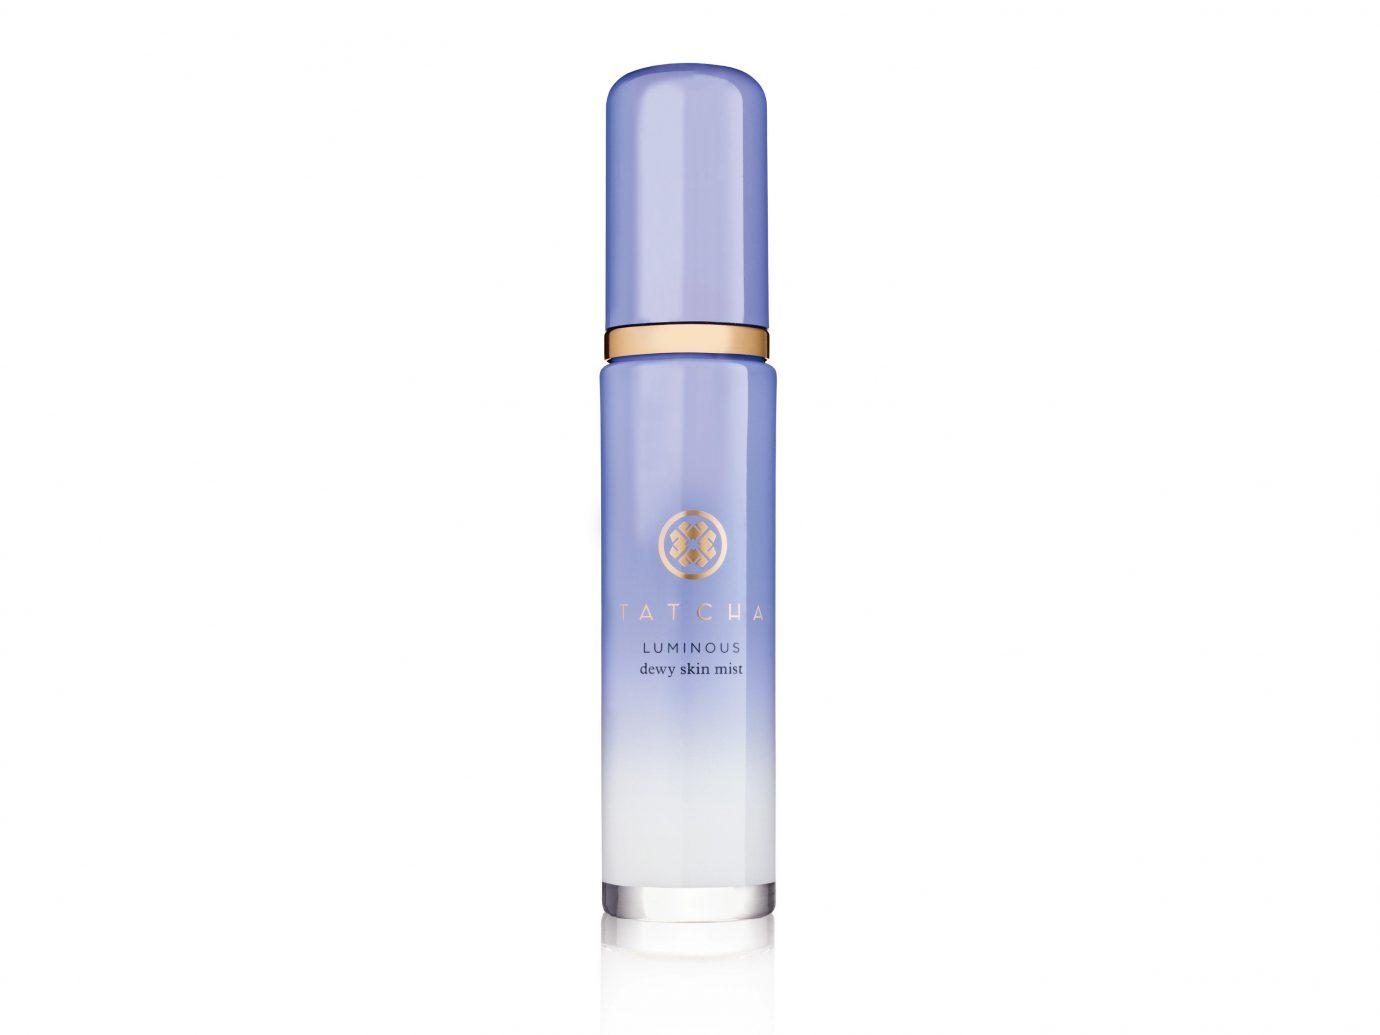 Beauty Health + Wellness Japan Kyoto San Francisco Travel Tips product perfume skin care liquid product design health & beauty spray